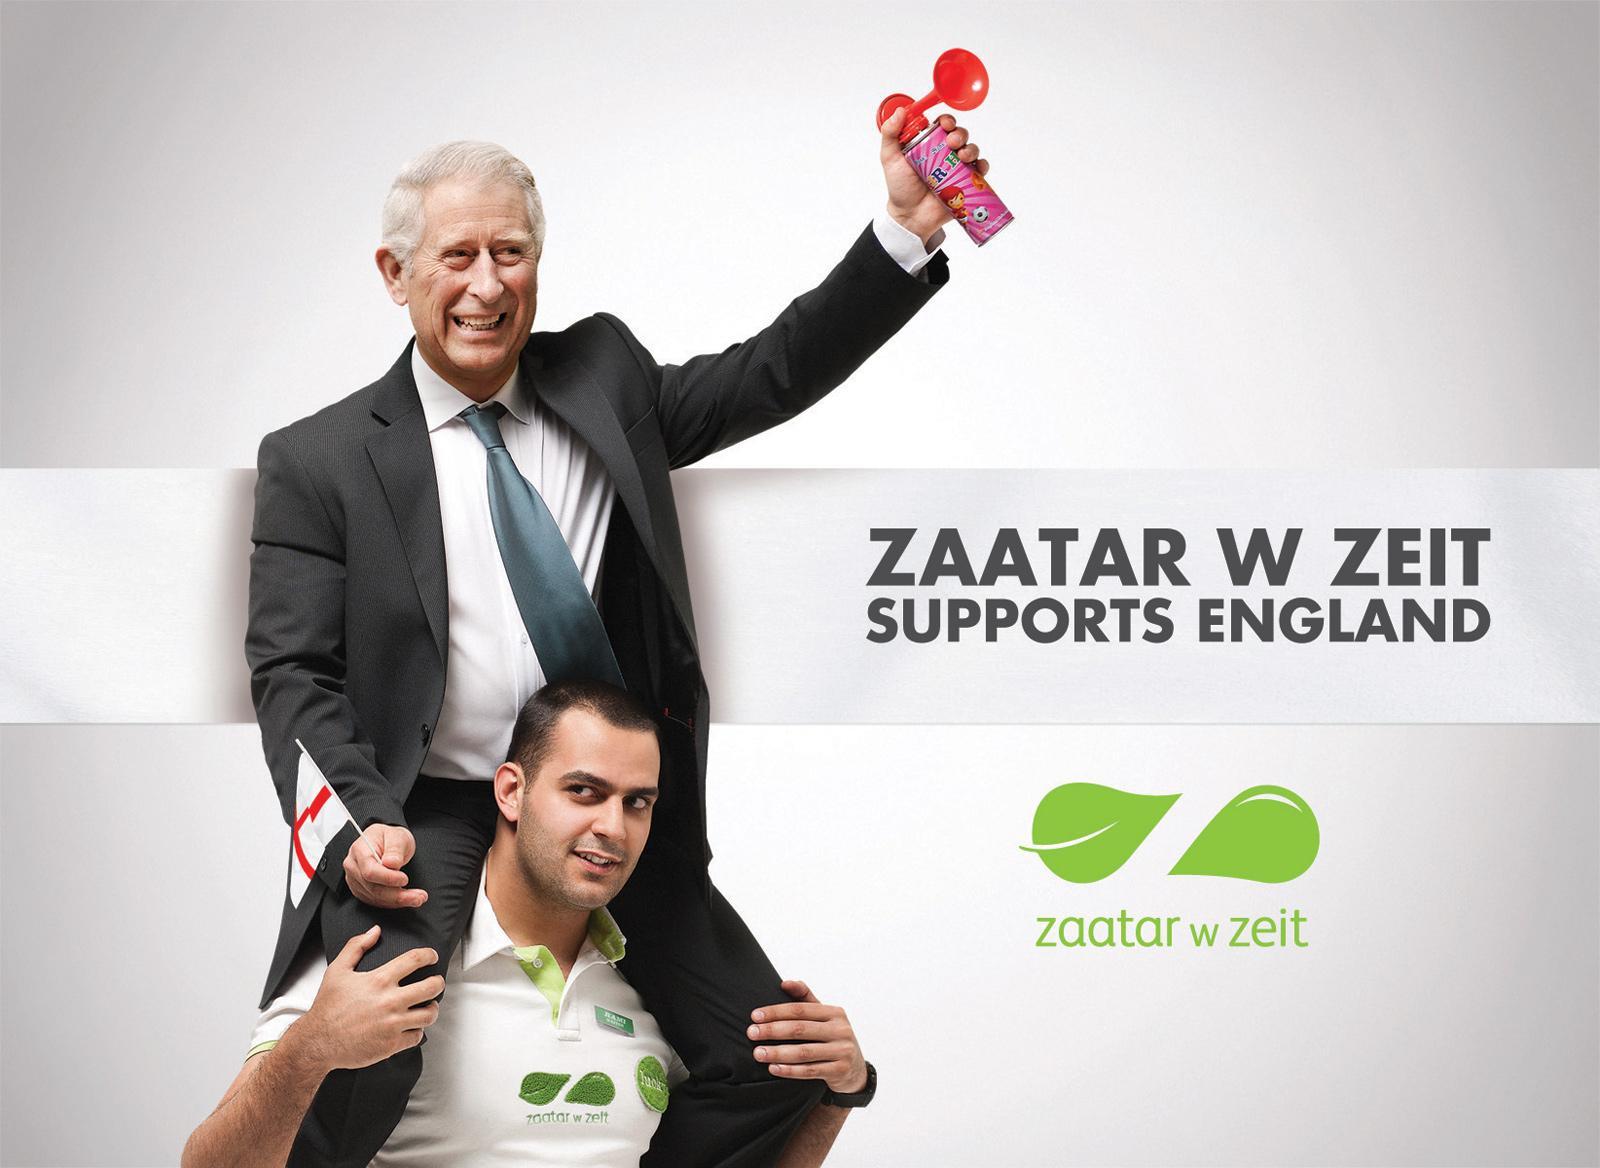 Zaatar W Zeit Print Ad -  Football Euro Cup 2012, Prince Charles